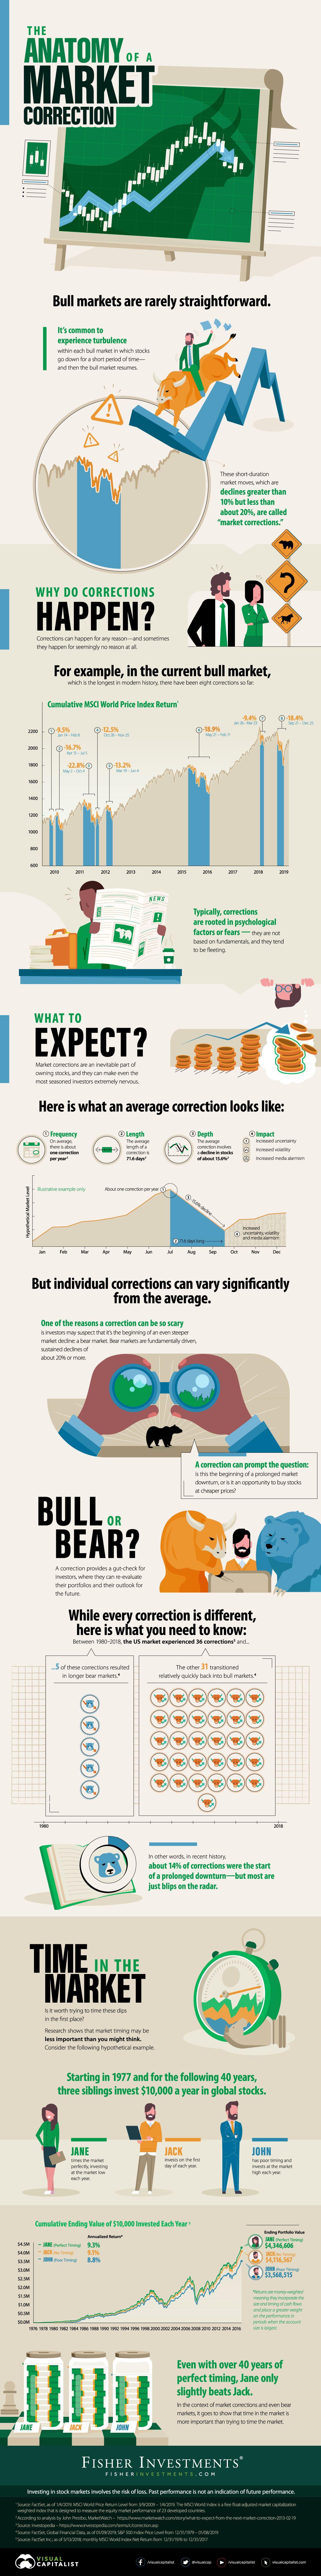 The anatomy of a market correction marketing